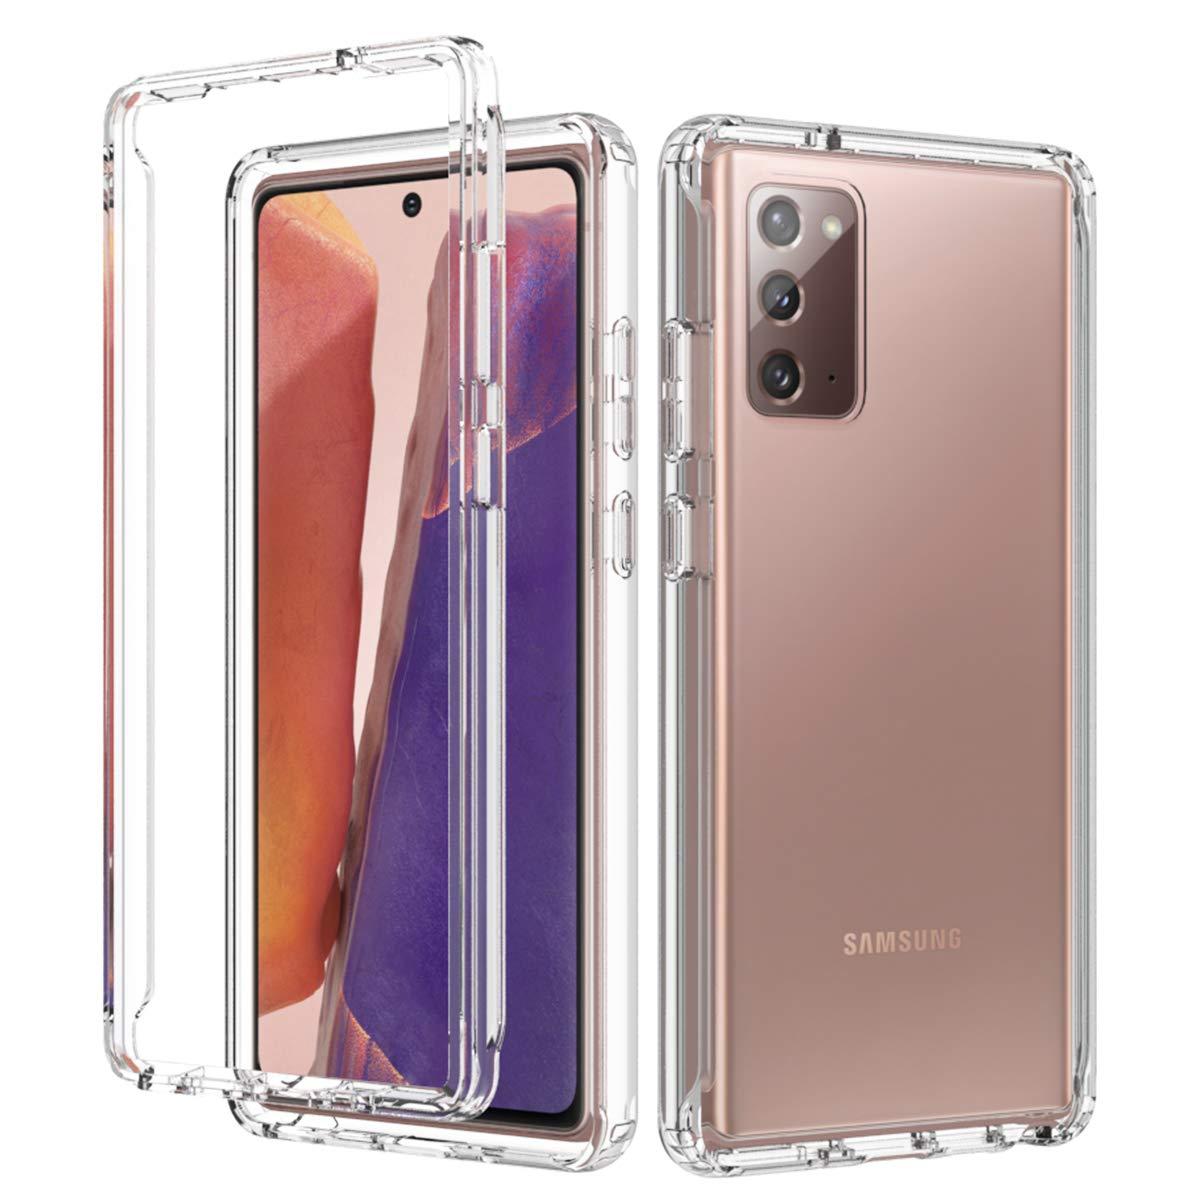 iMangoo Samsung Galaxy Note 20 Funda para teléfono Ultrafina a prueba de golpes TPU Silicona Funda protectora transparente para teléfono móvil Funda protectora para Samsung Galaxy Note 20 Crystal: Amazon.es: Electrónica